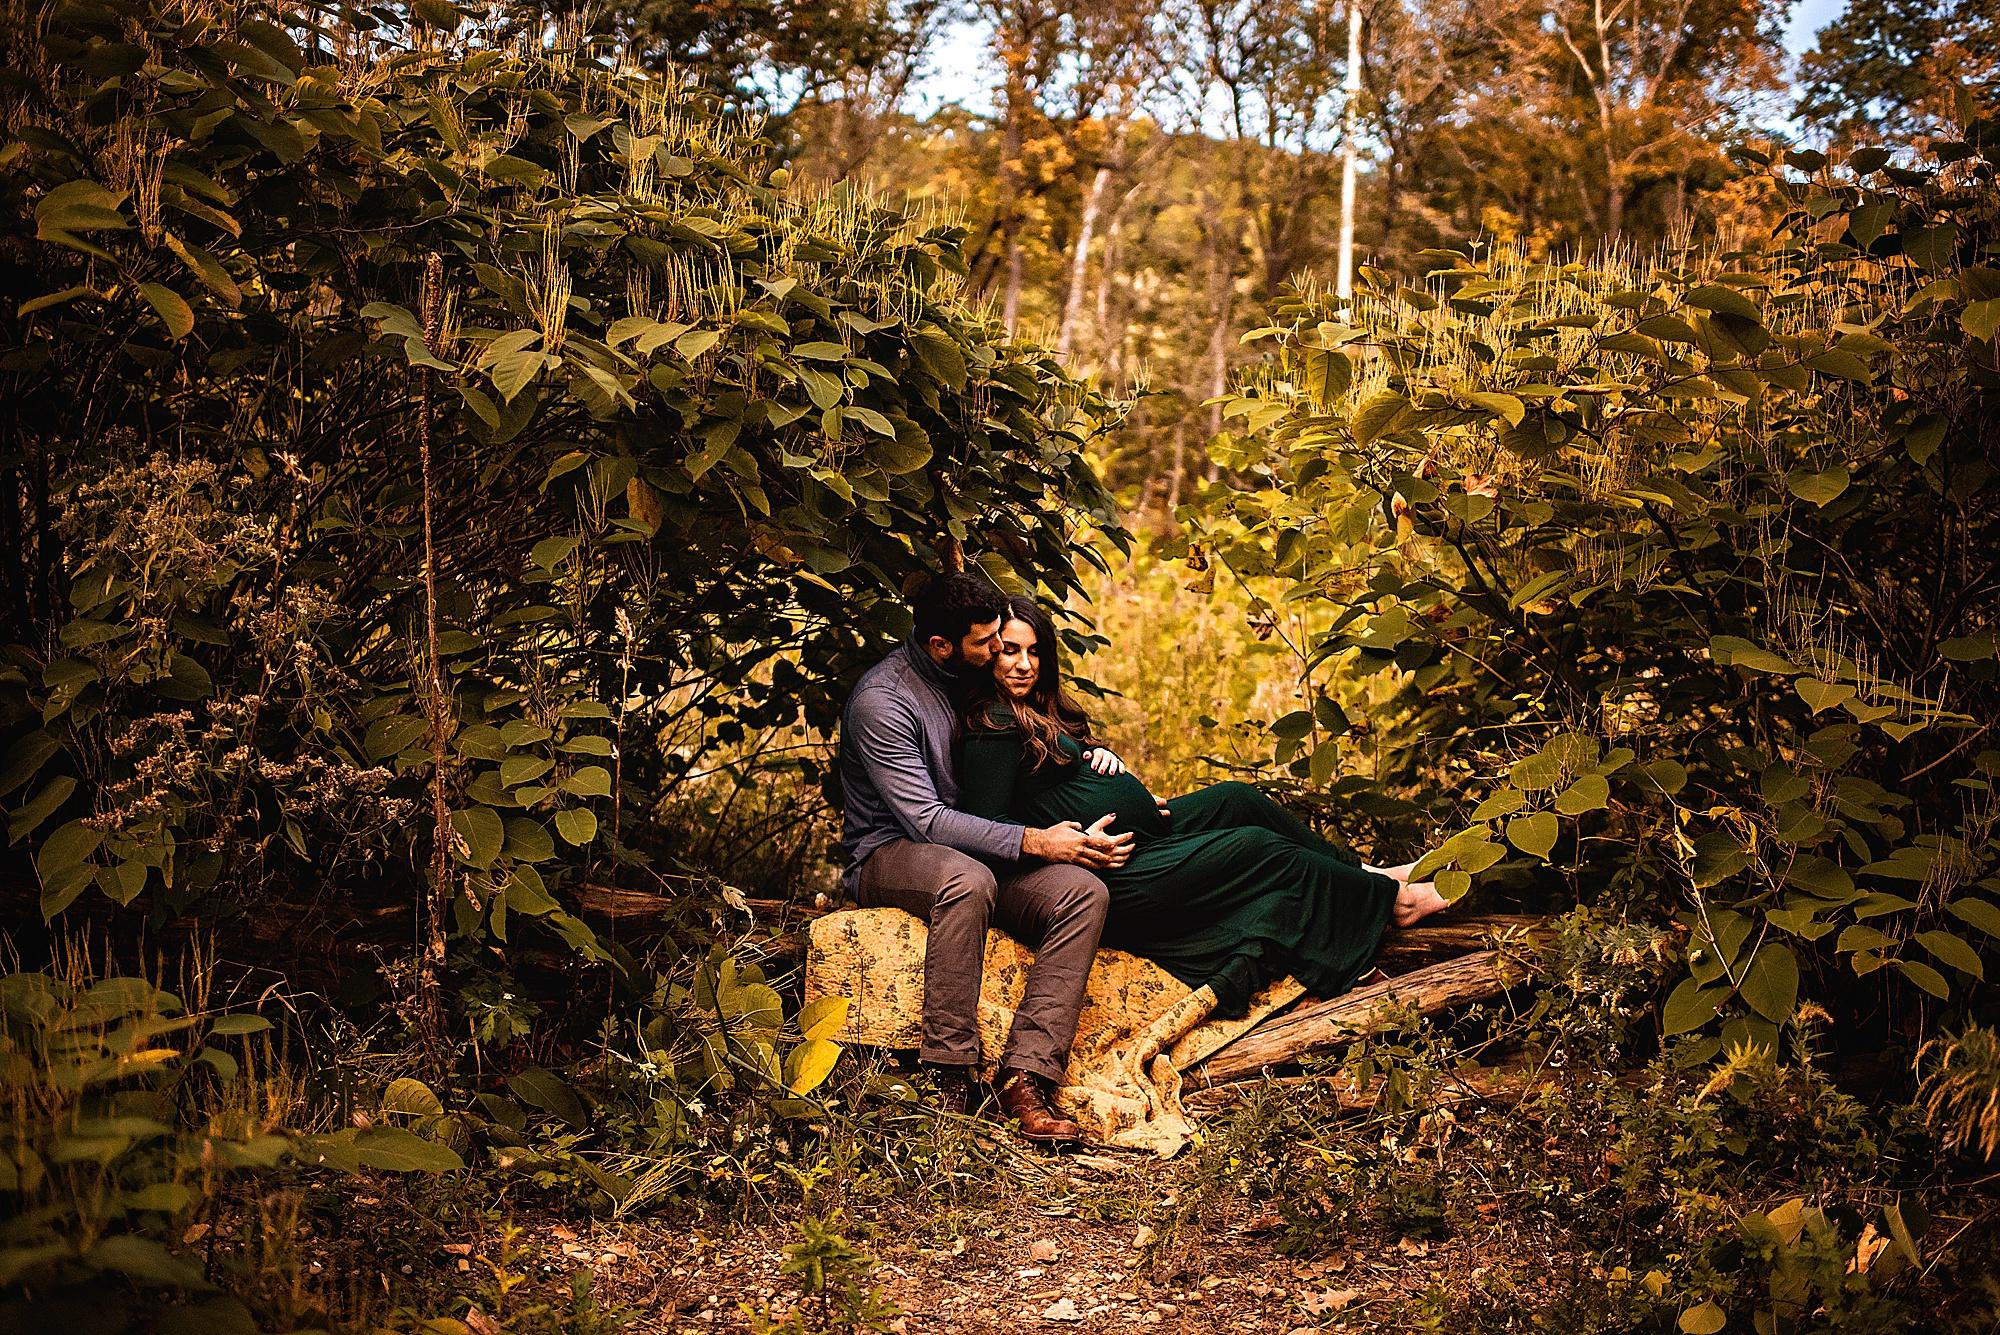 lauren-grayson-photography-akron-ohio-maternity-session-fall-hammer_0030.jpg